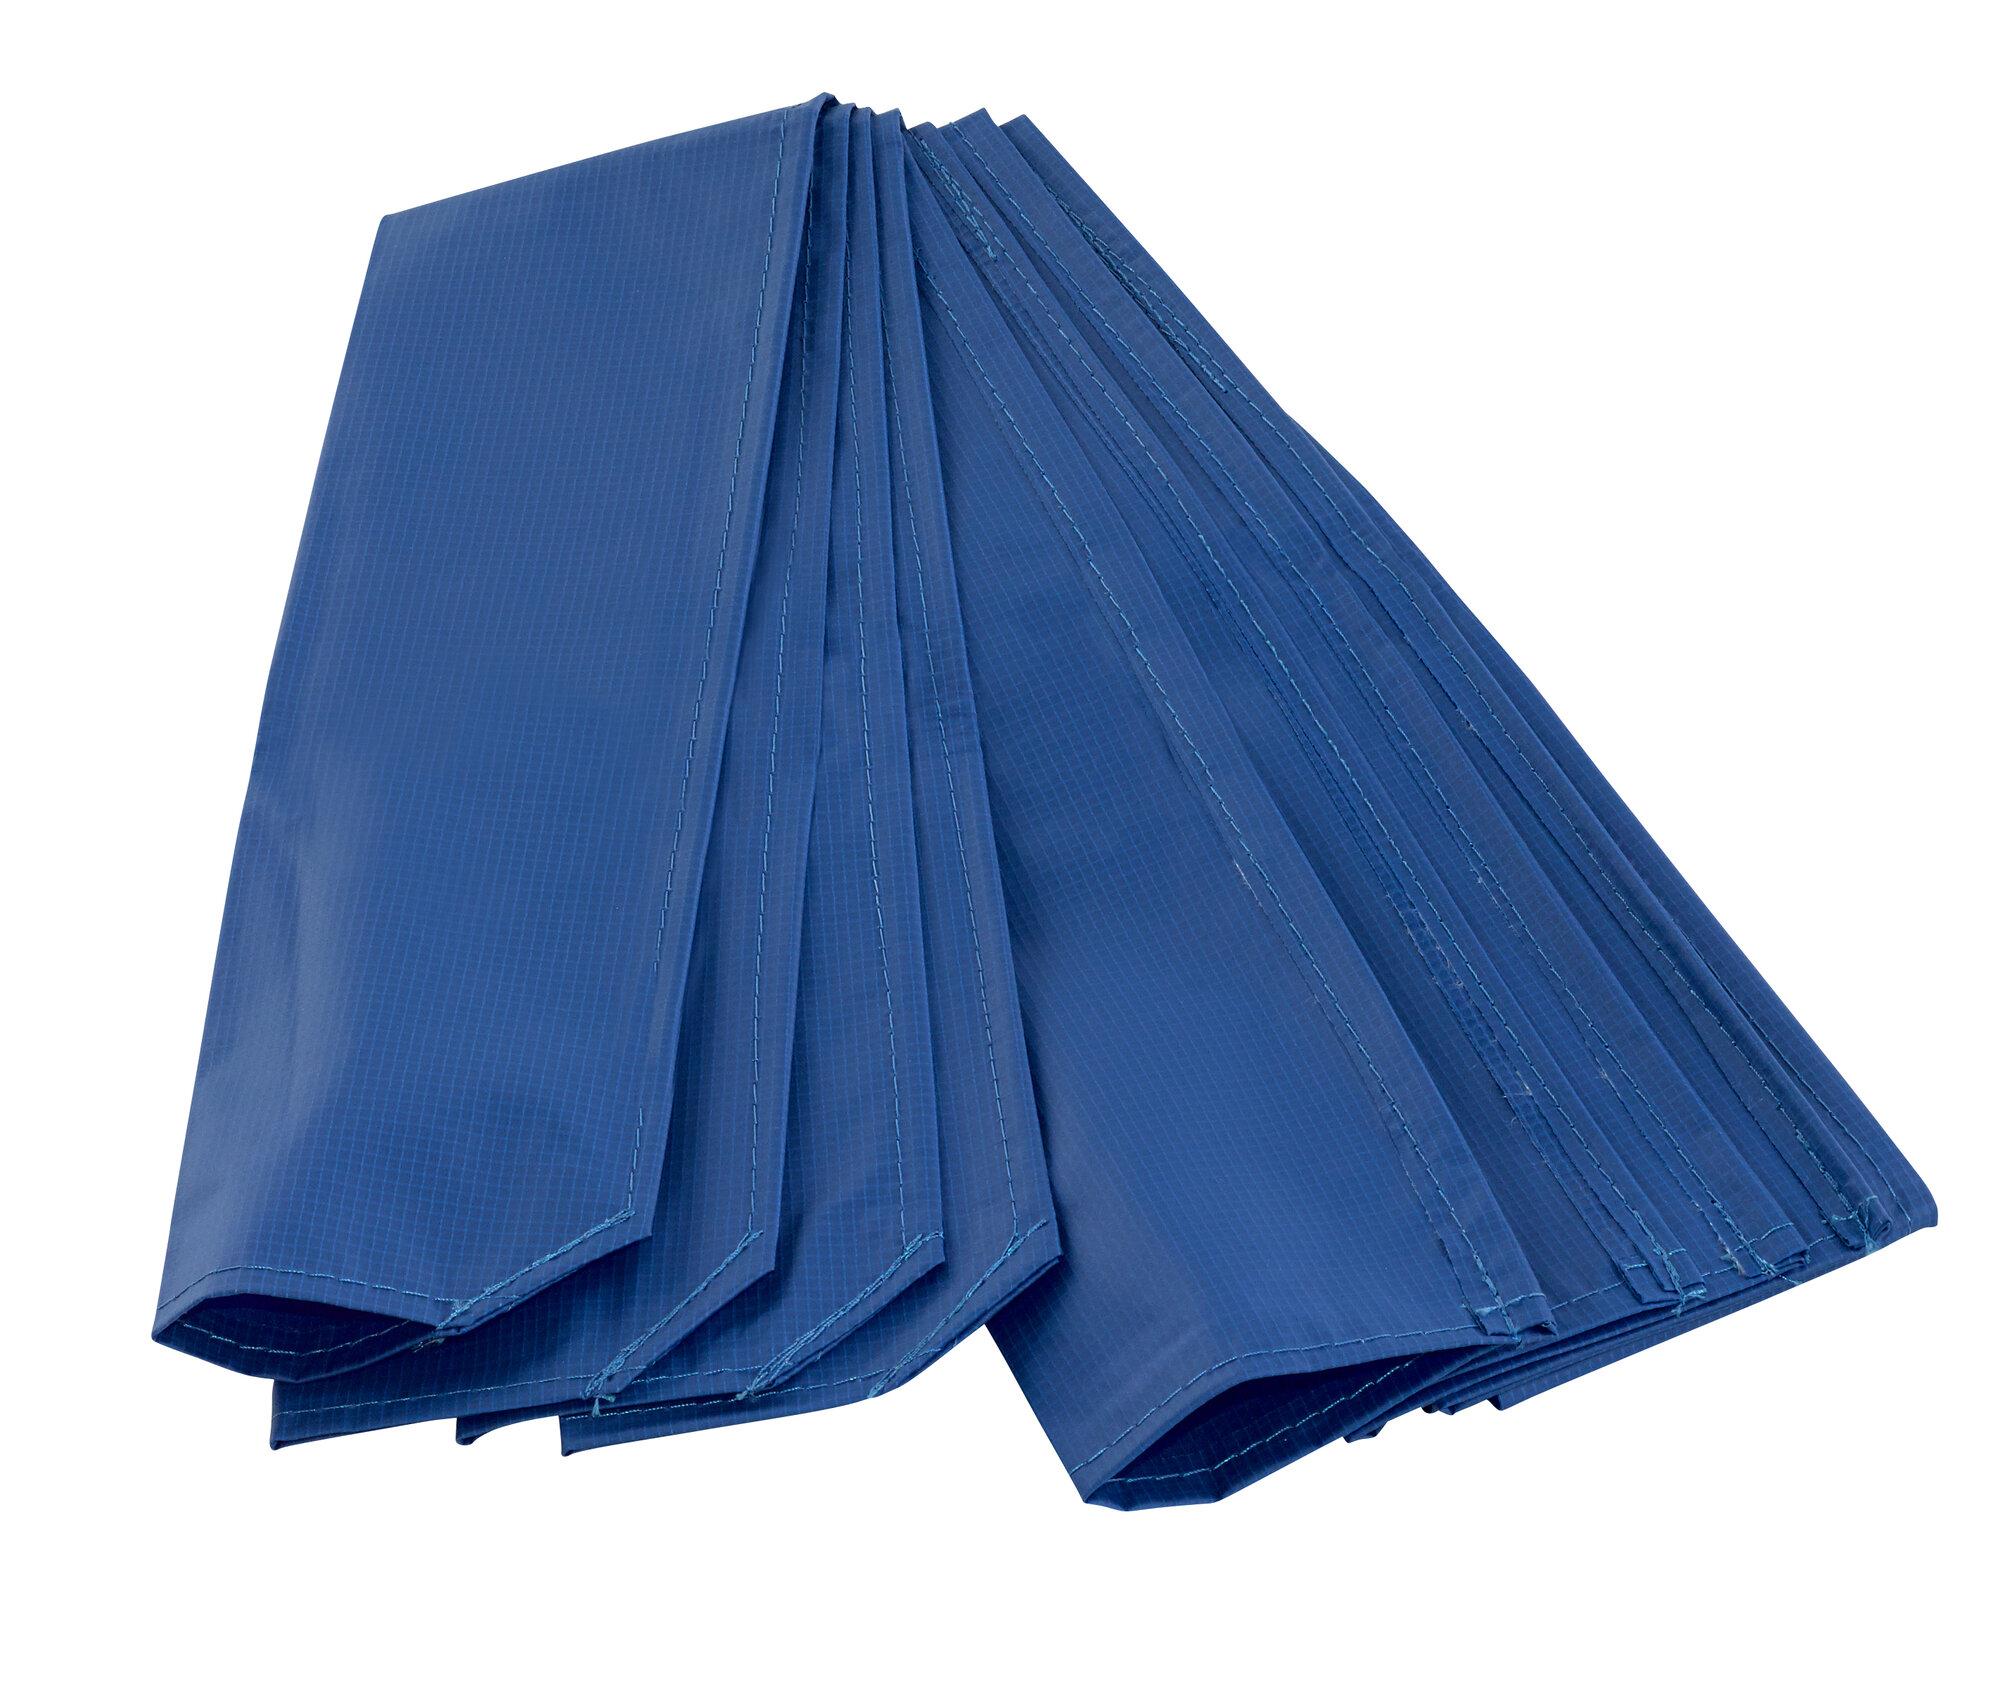 Trampoline Enclosure Foam Sleeves: Upper Bounce Trampoline Pole Foam Sleeve Set Of 4